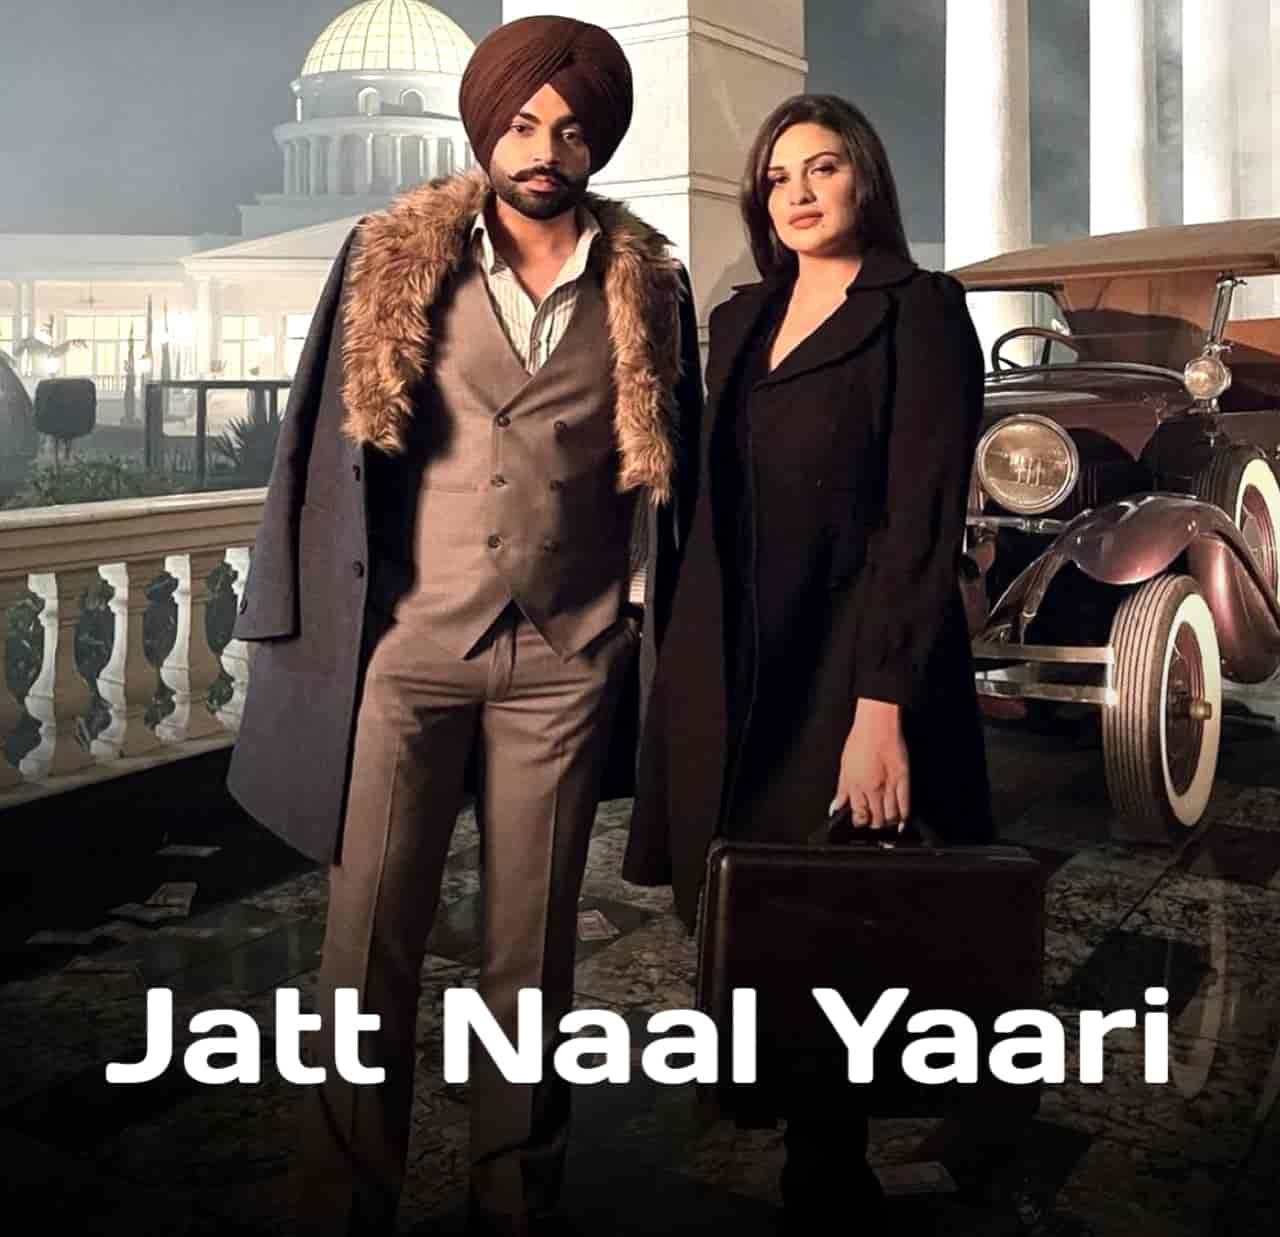 JATT NAAL YAARI LYRICS - Jordan Sandhu | Himanshi Khurana